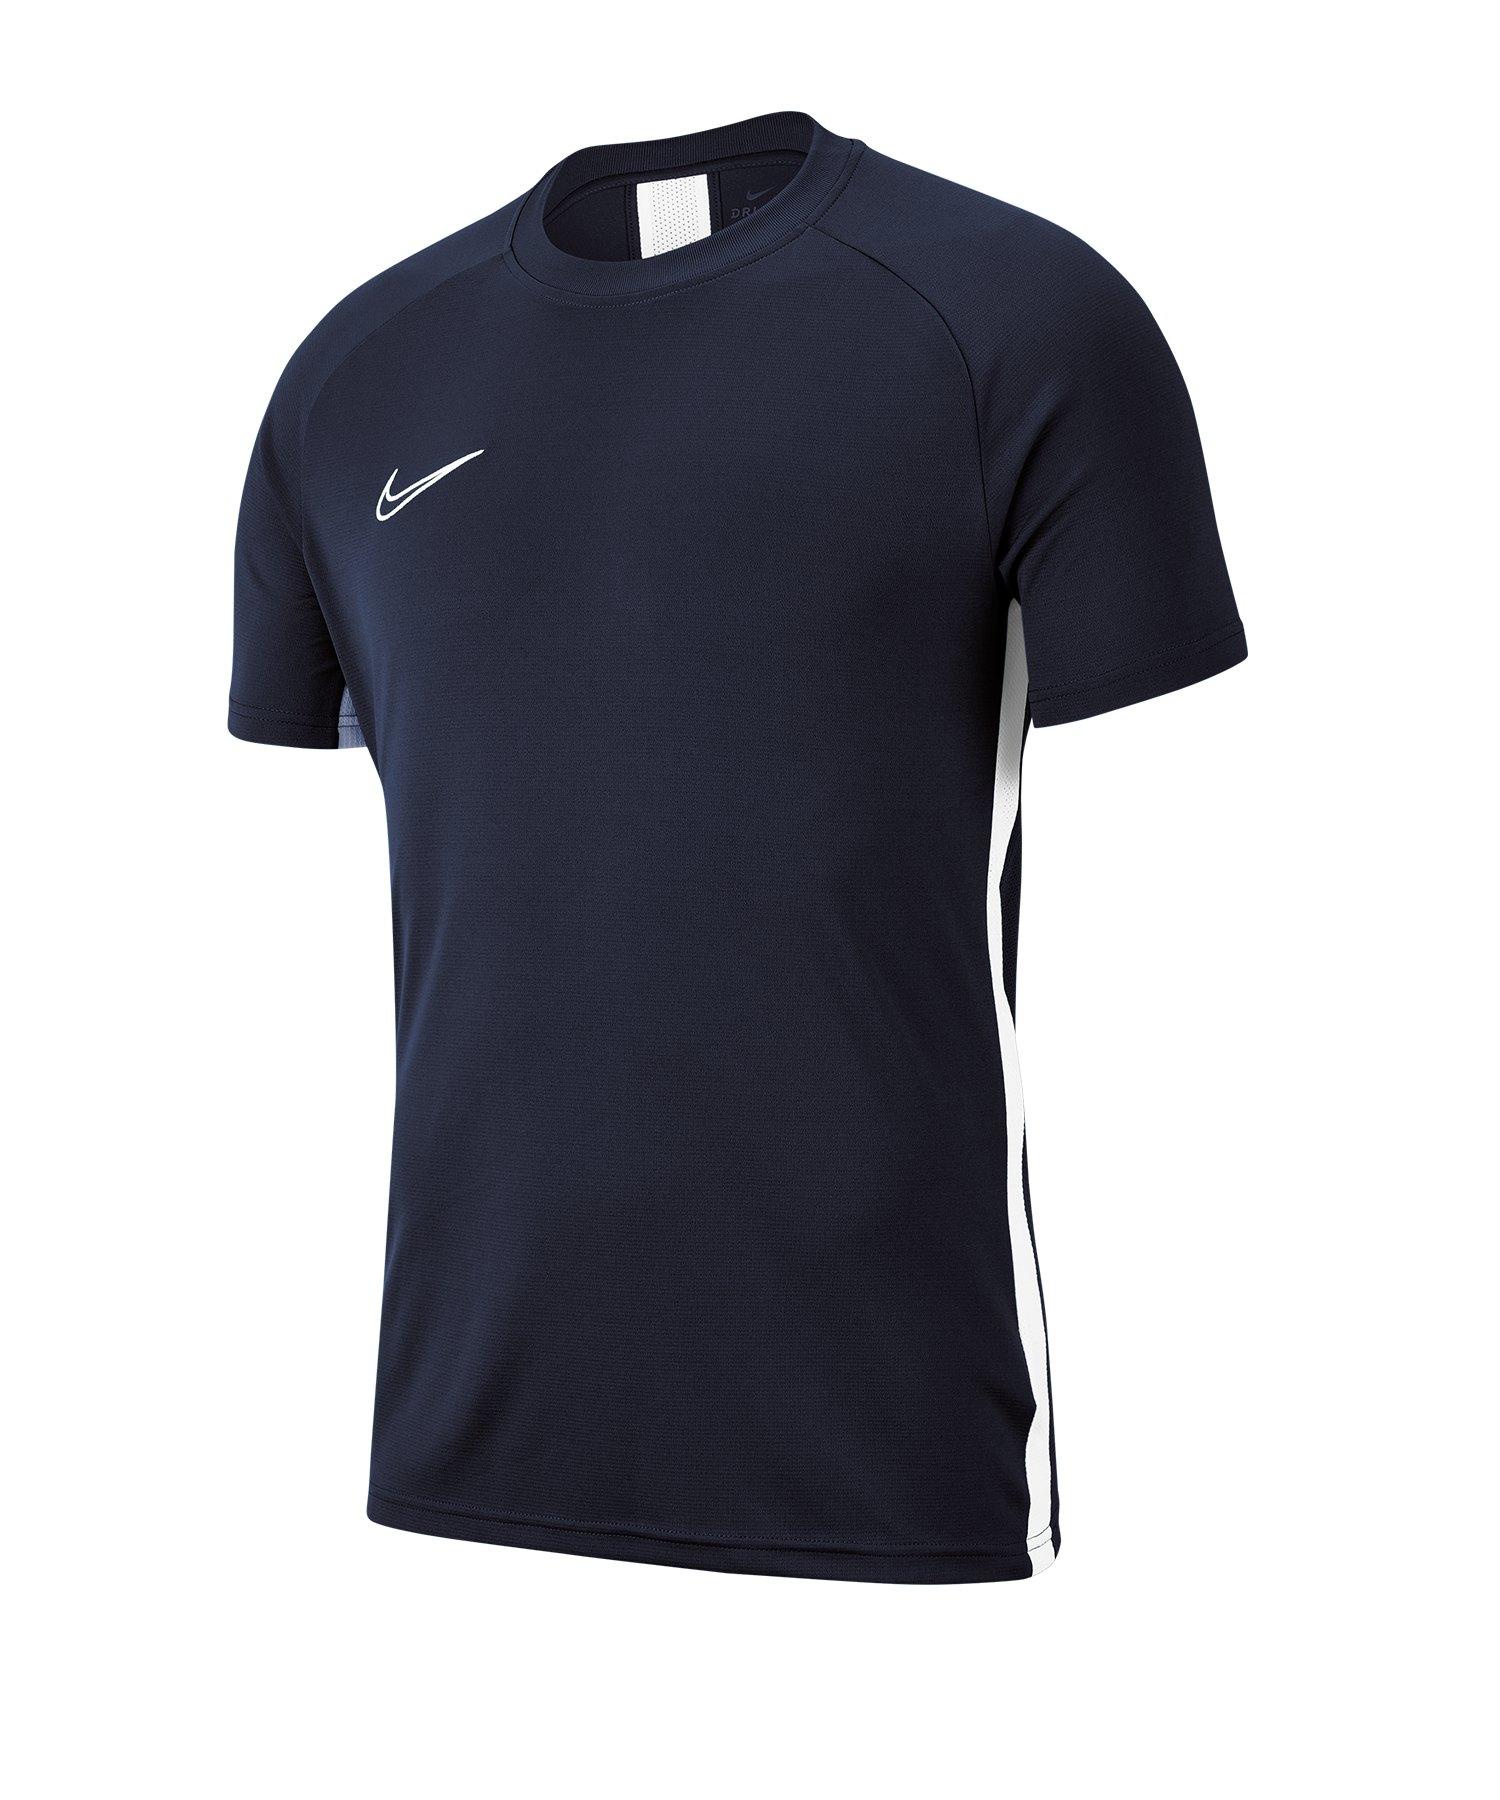 Nike Academy 19 Dri-FIT T-Shirt Kids Blau F451 - Blau